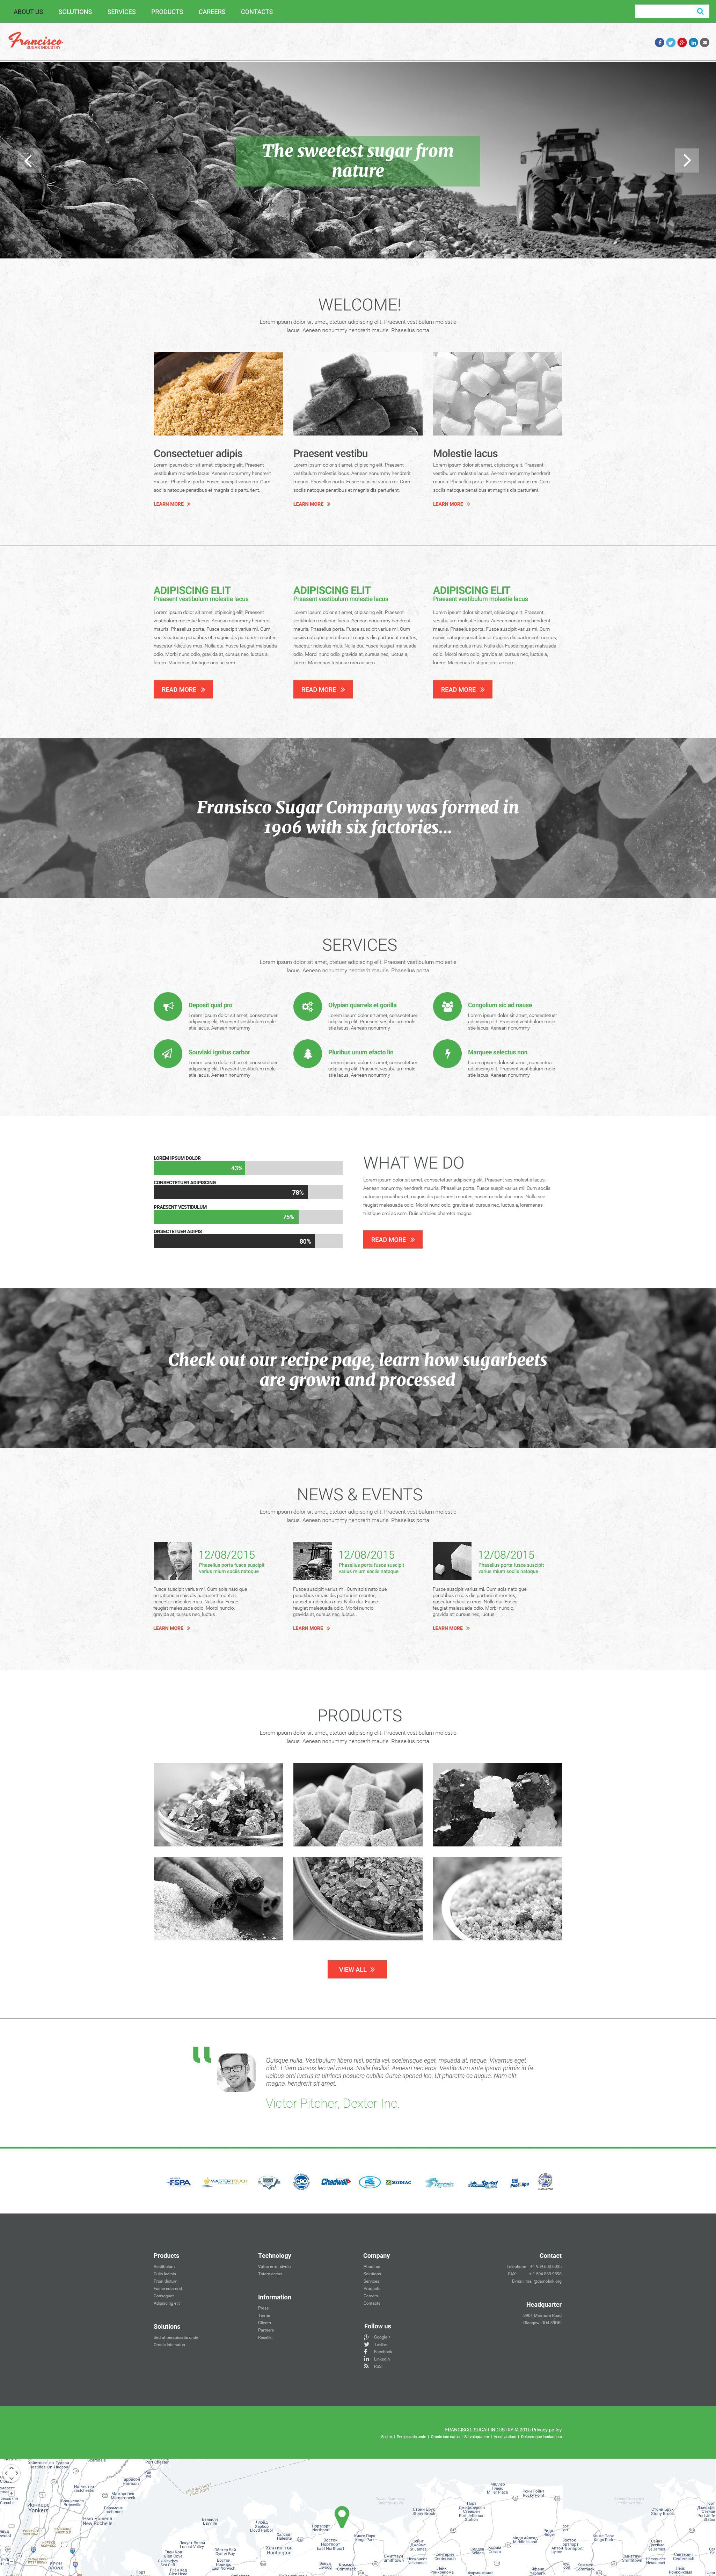 """Francisco Sugar Industry"" modèle web adaptatif #55240 - screenshot"